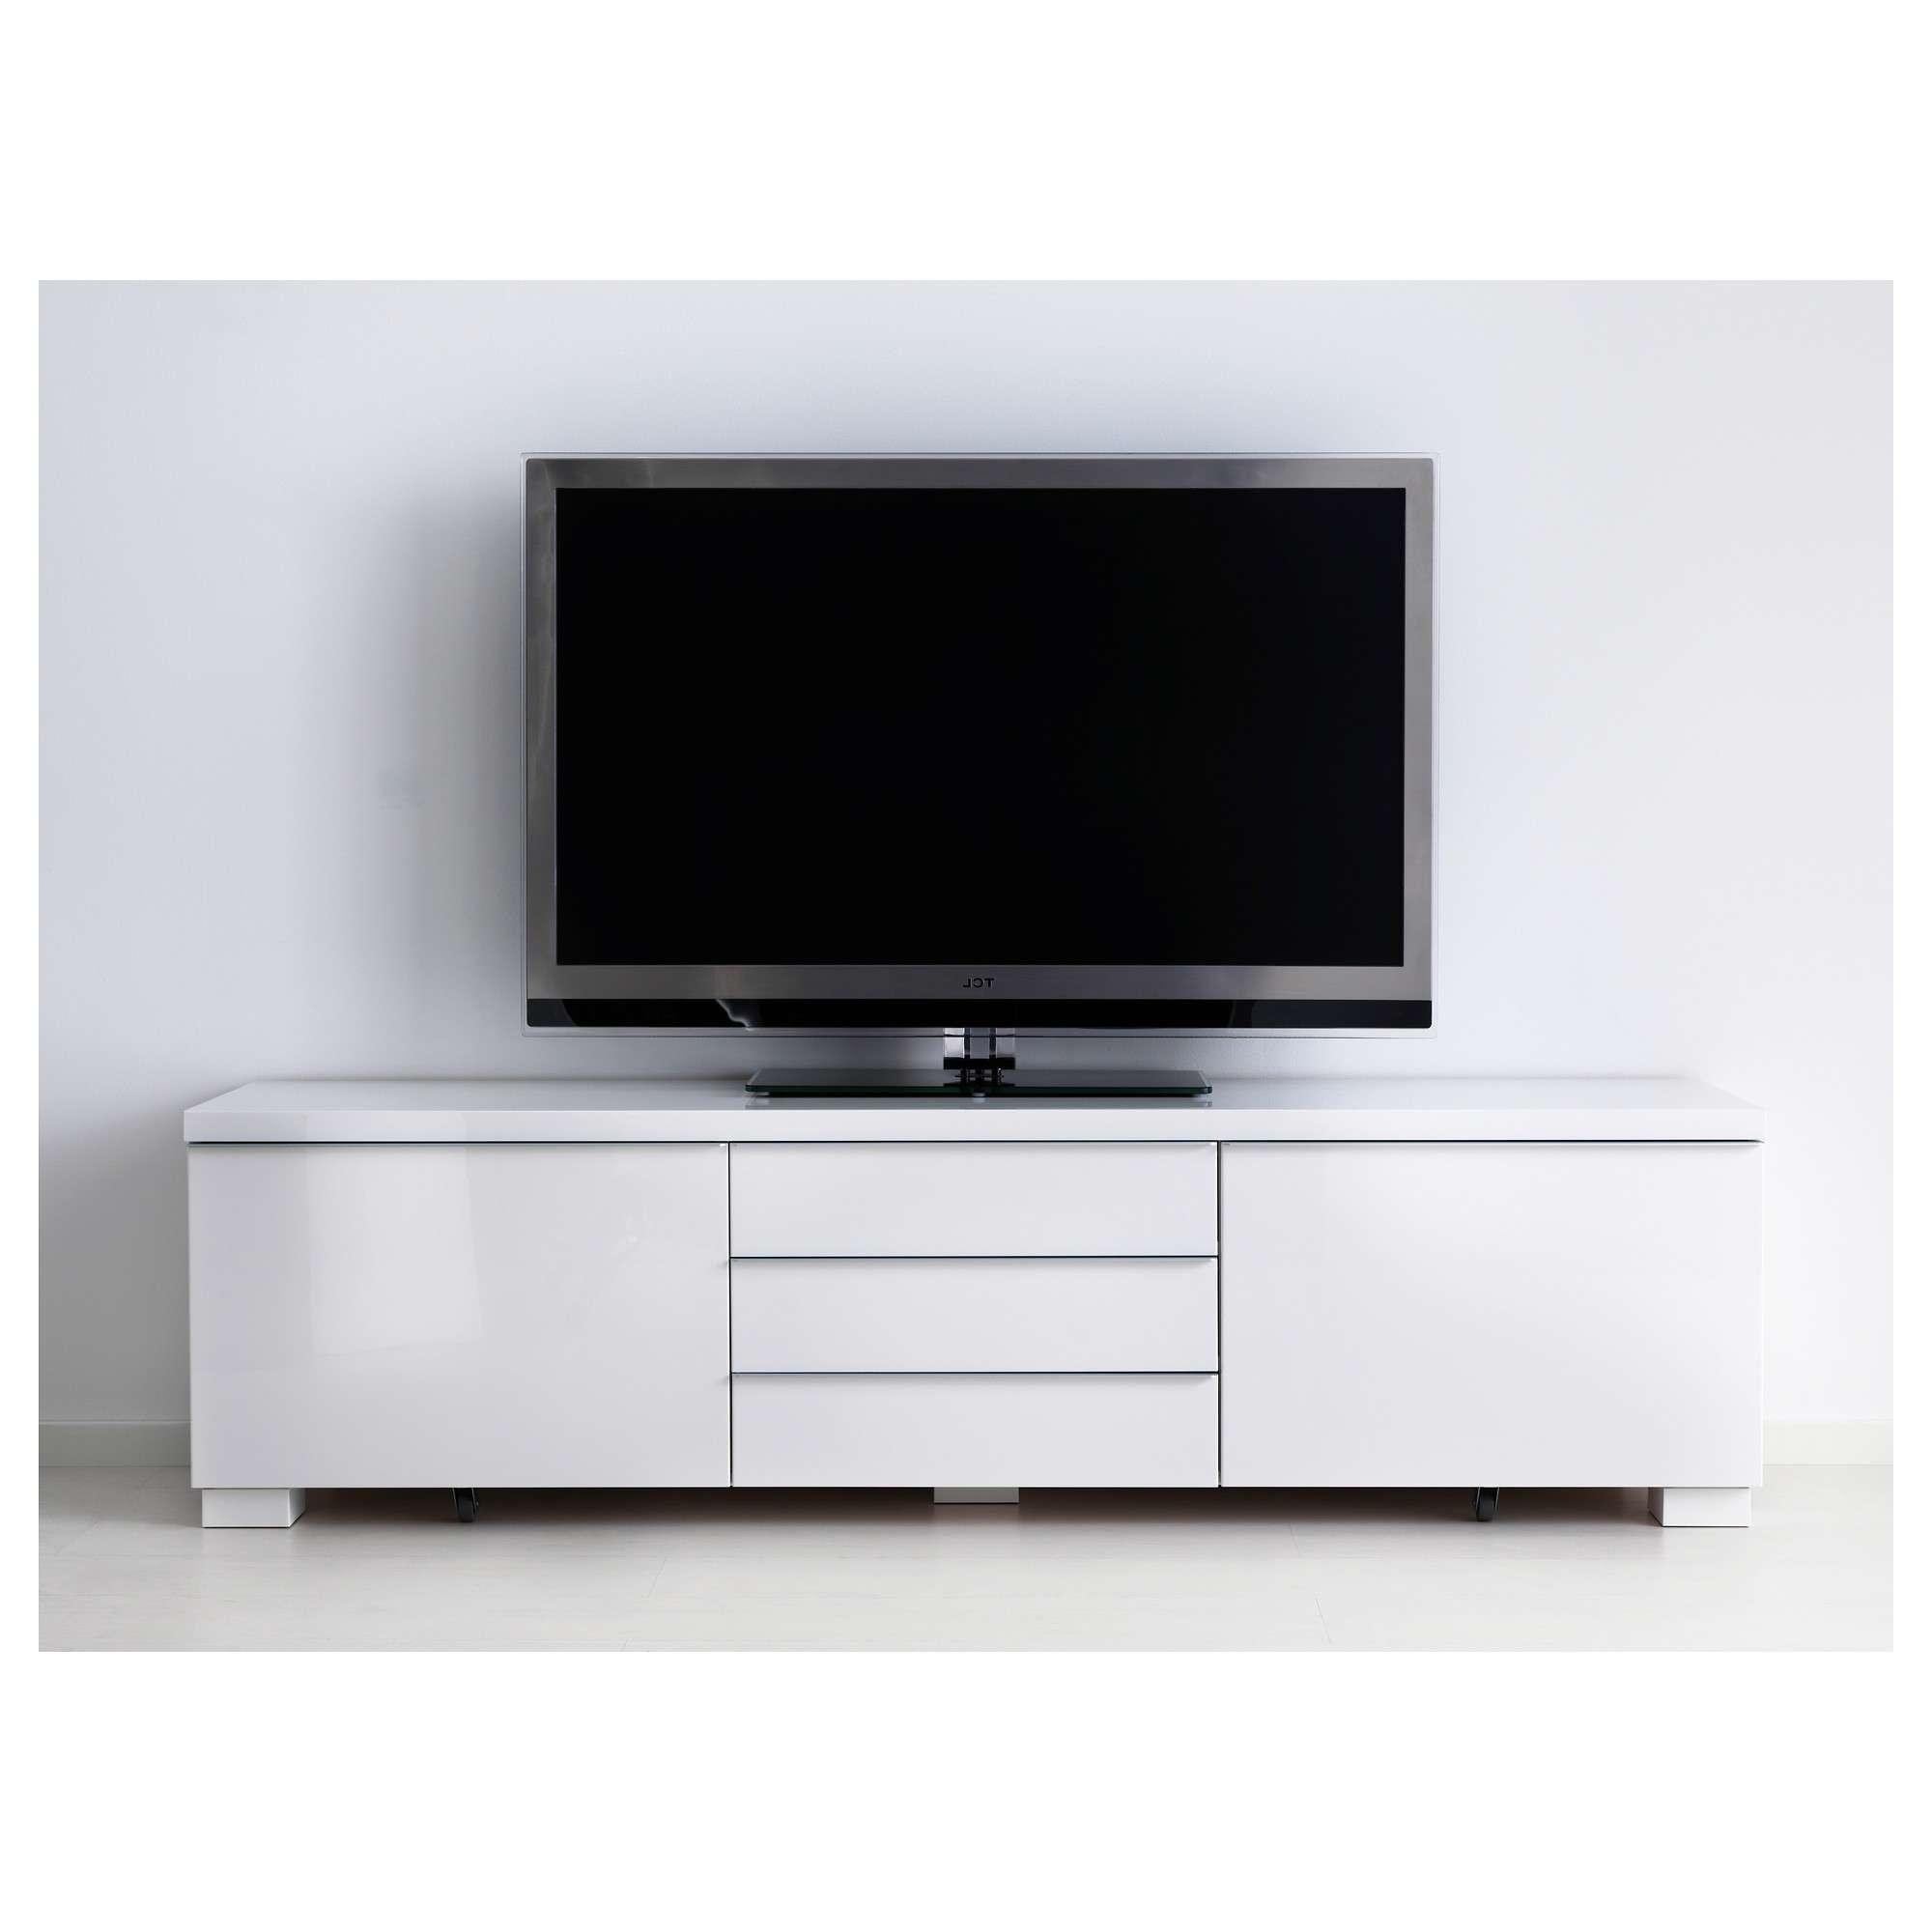 Bestå Burs Tv Bench High Gloss White 180x41 Cm – Ikea For White Tv Cabinets (View 3 of 20)